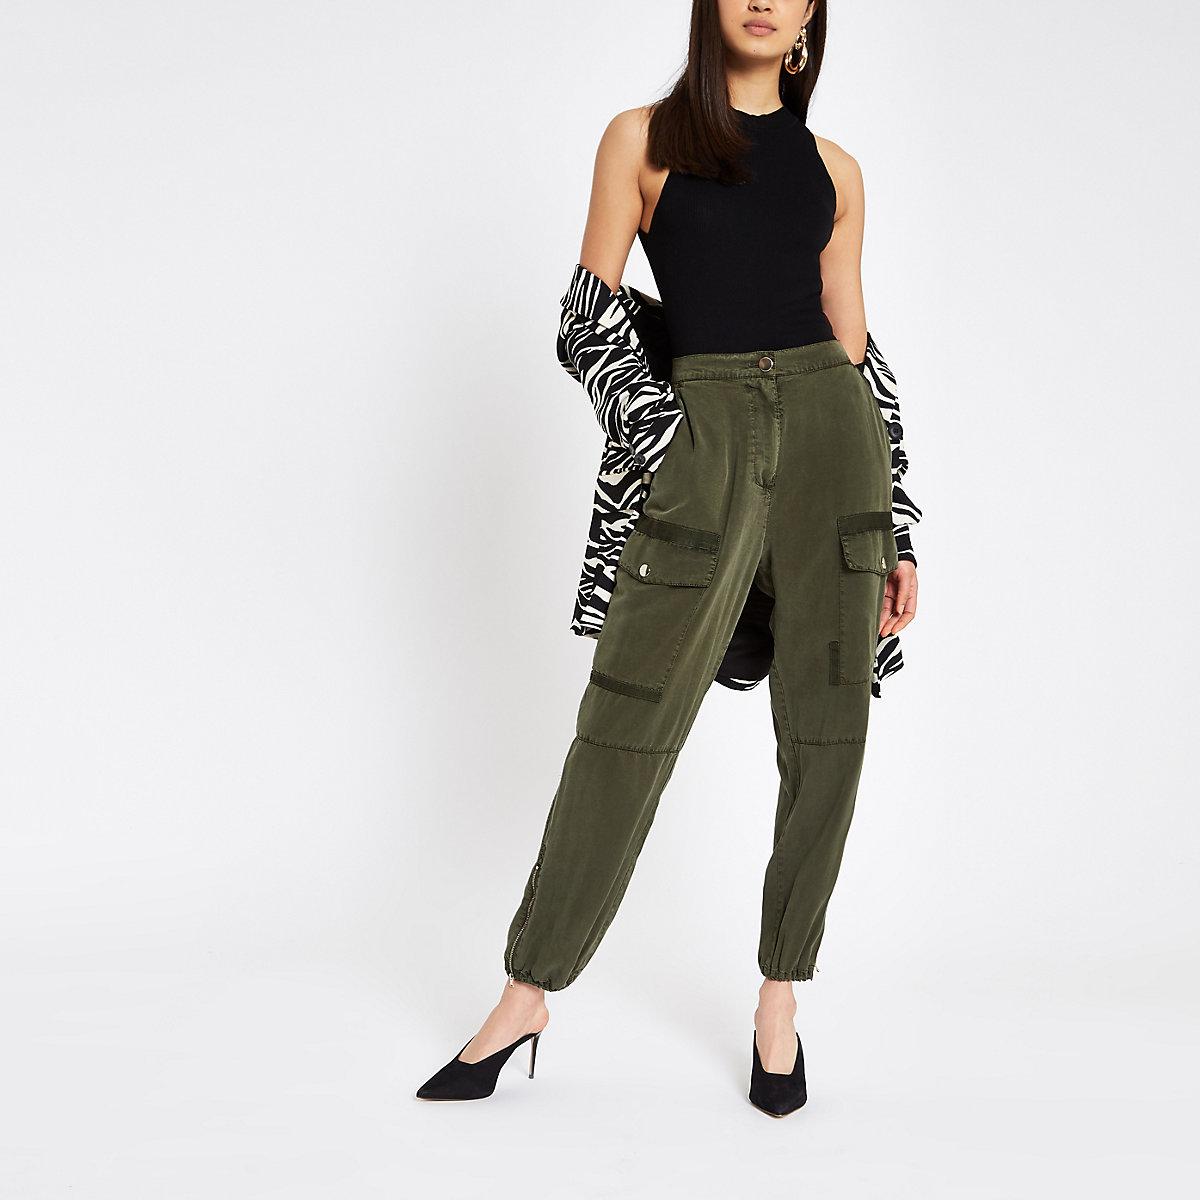 Khaki Hailey utility pants